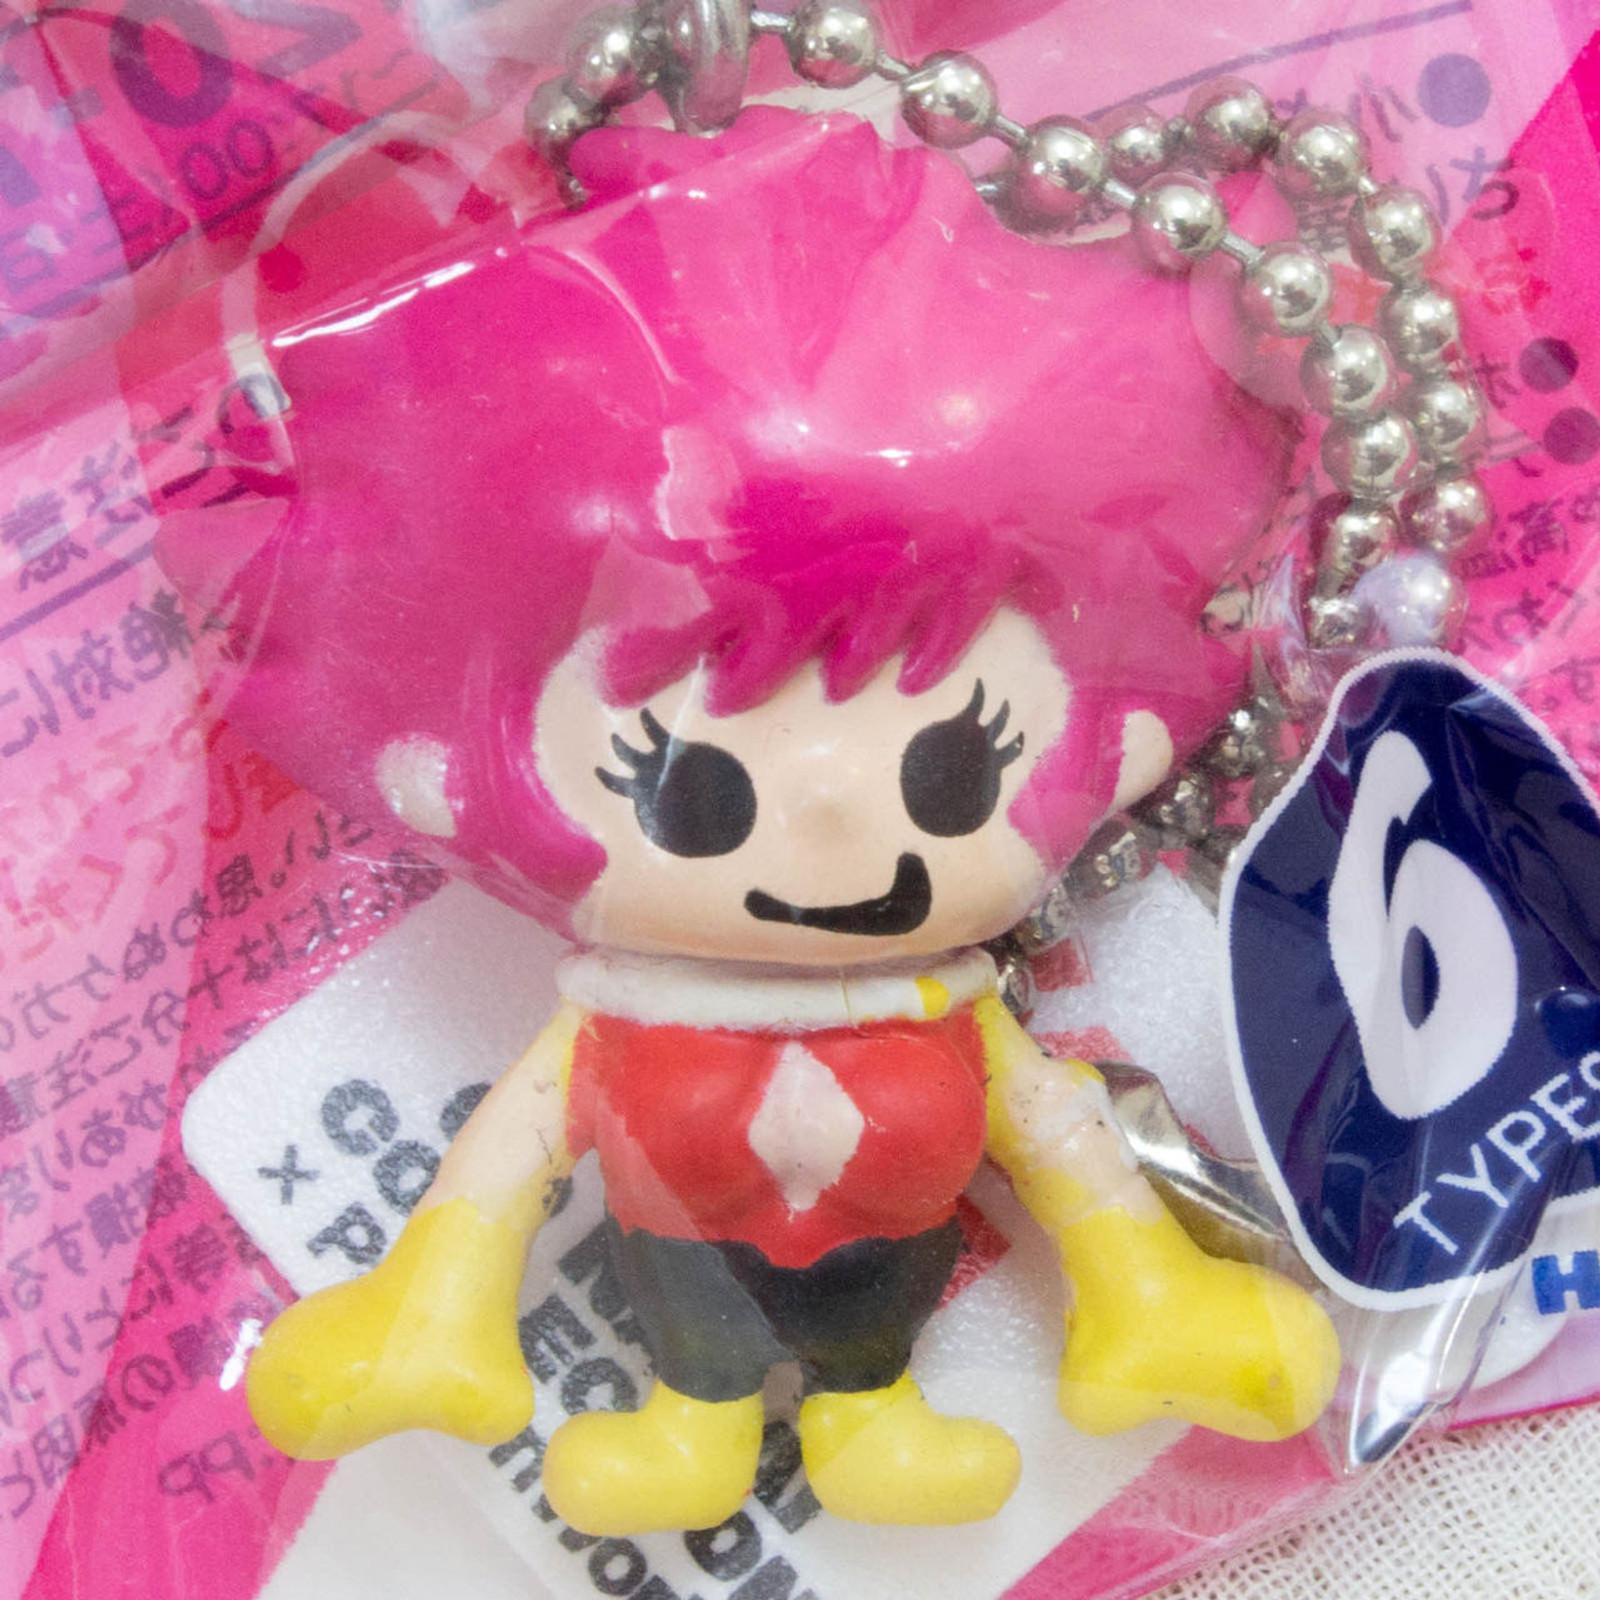 Cutie Honey Mini Figure Ballchain Nagai Go Panson Works JAPAN ANIME MANGA